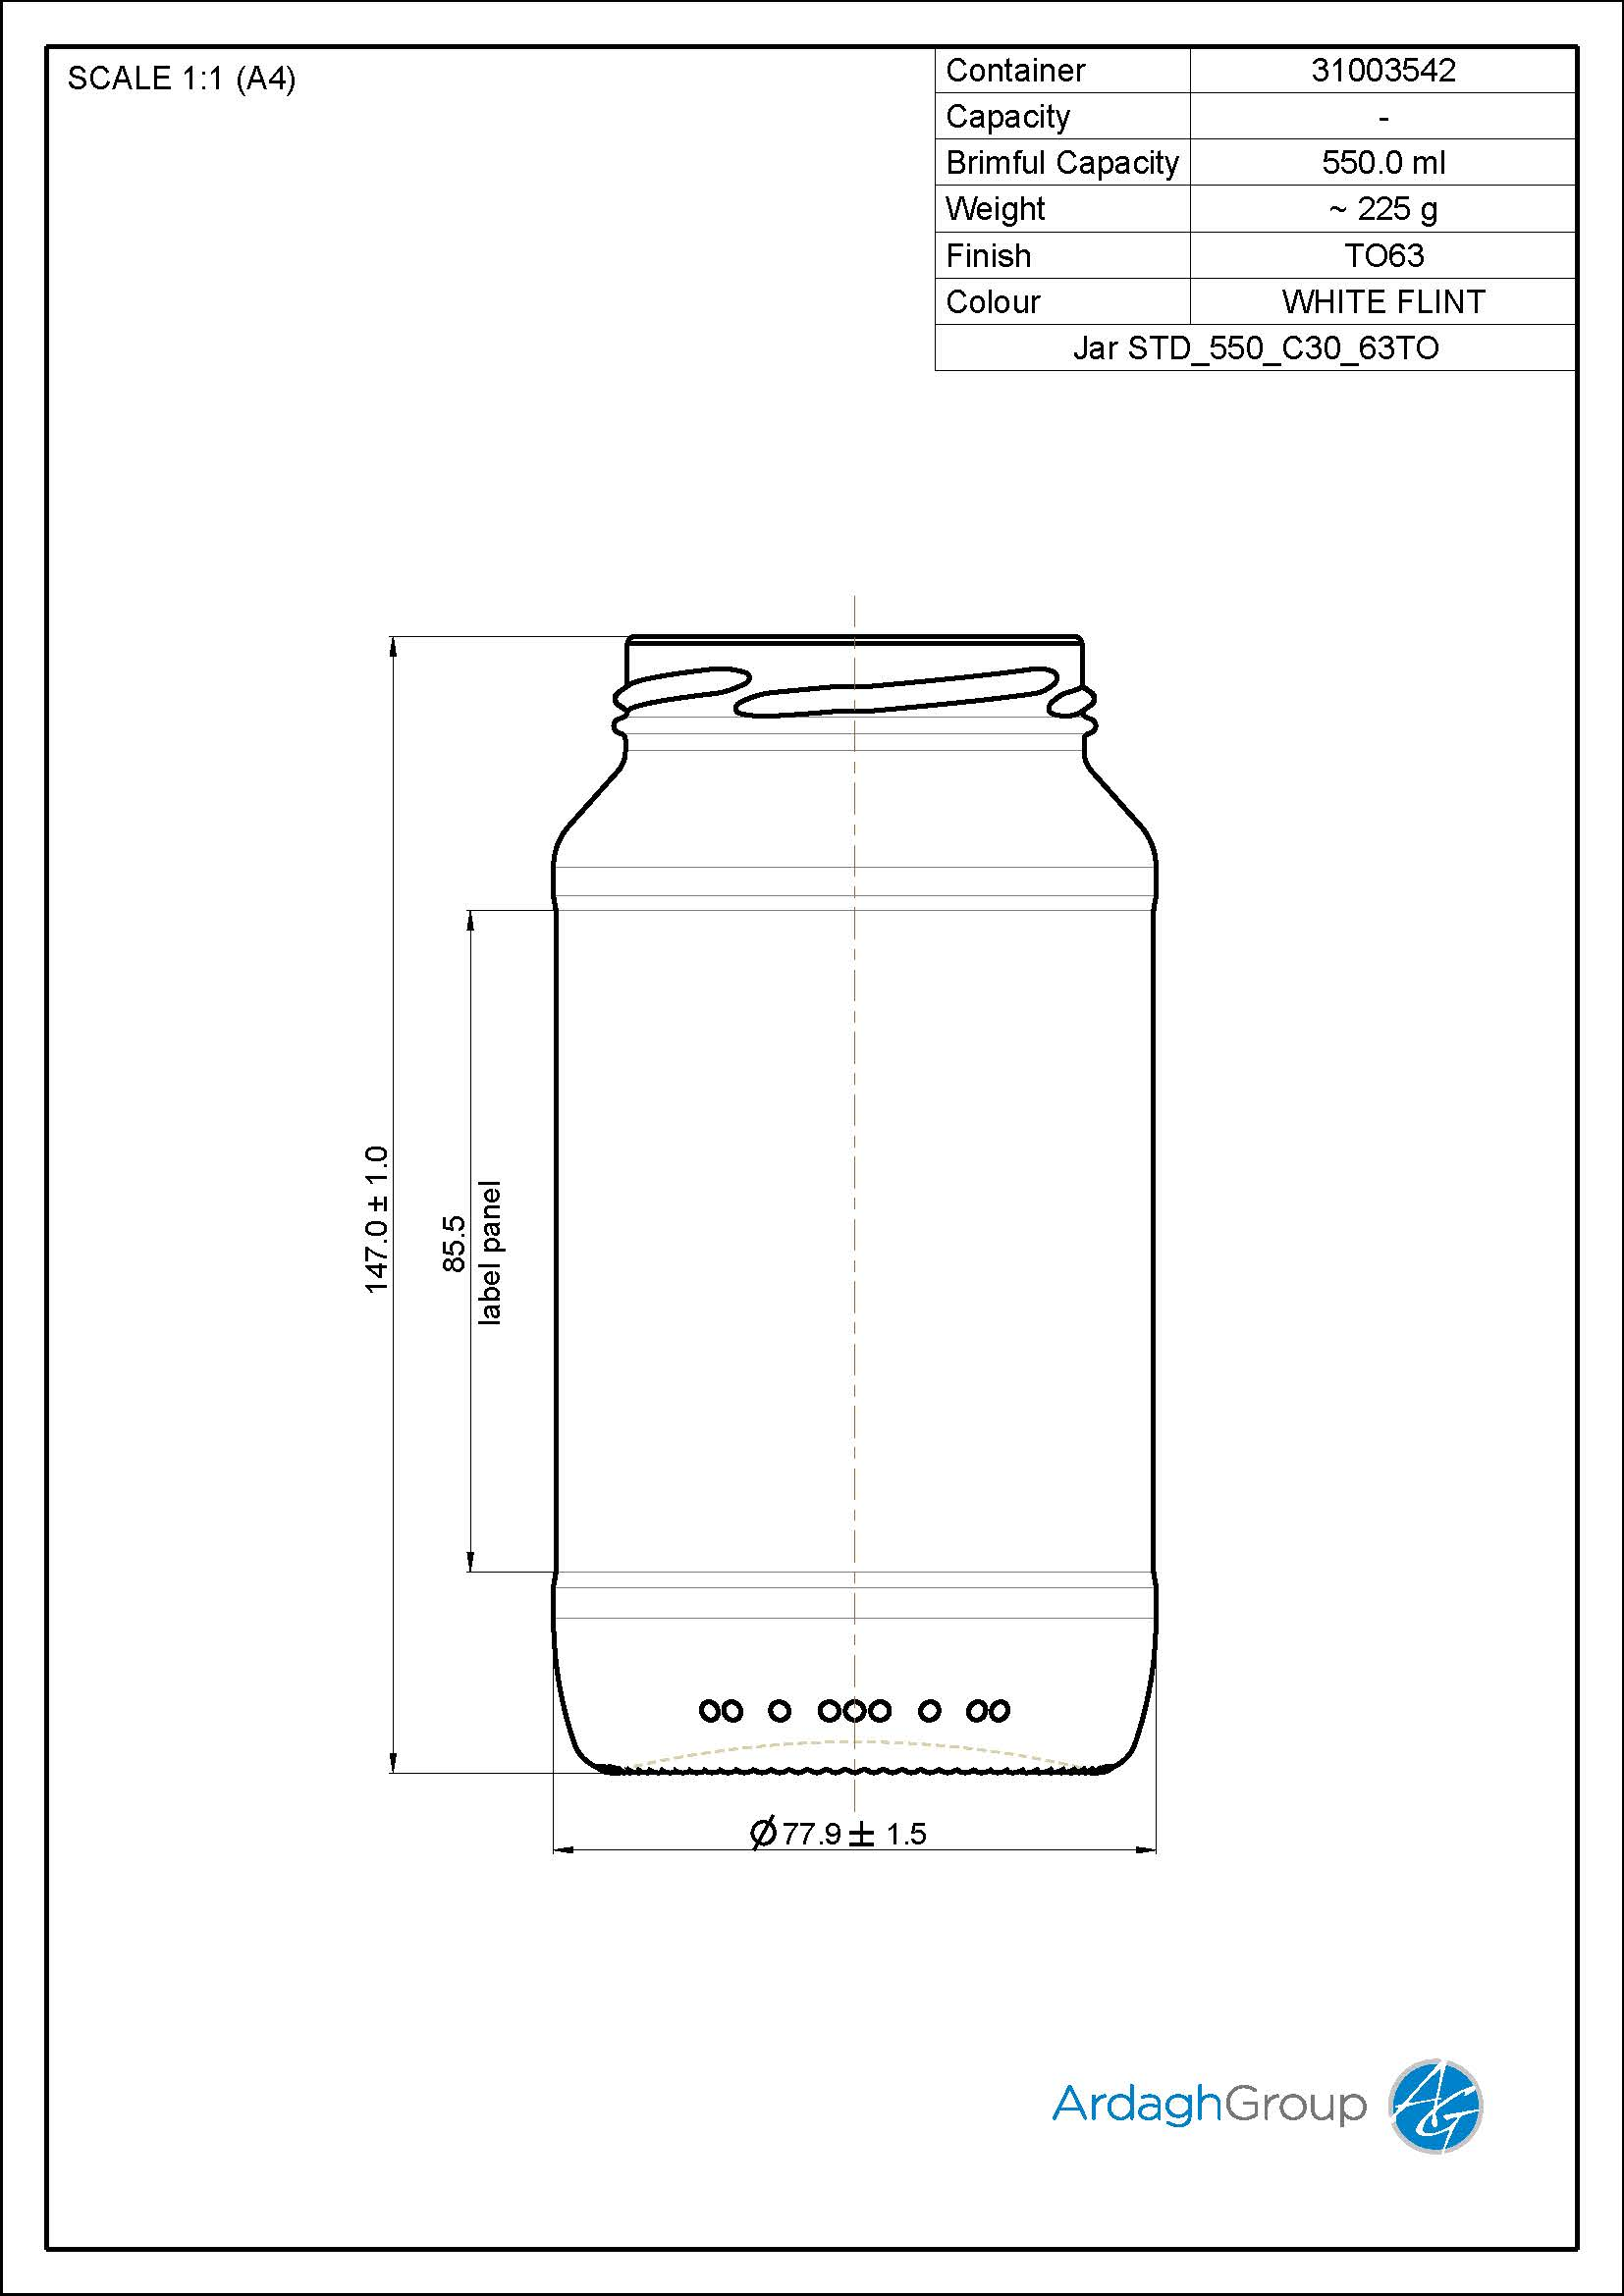 Jar STD01 550 C30 63TO